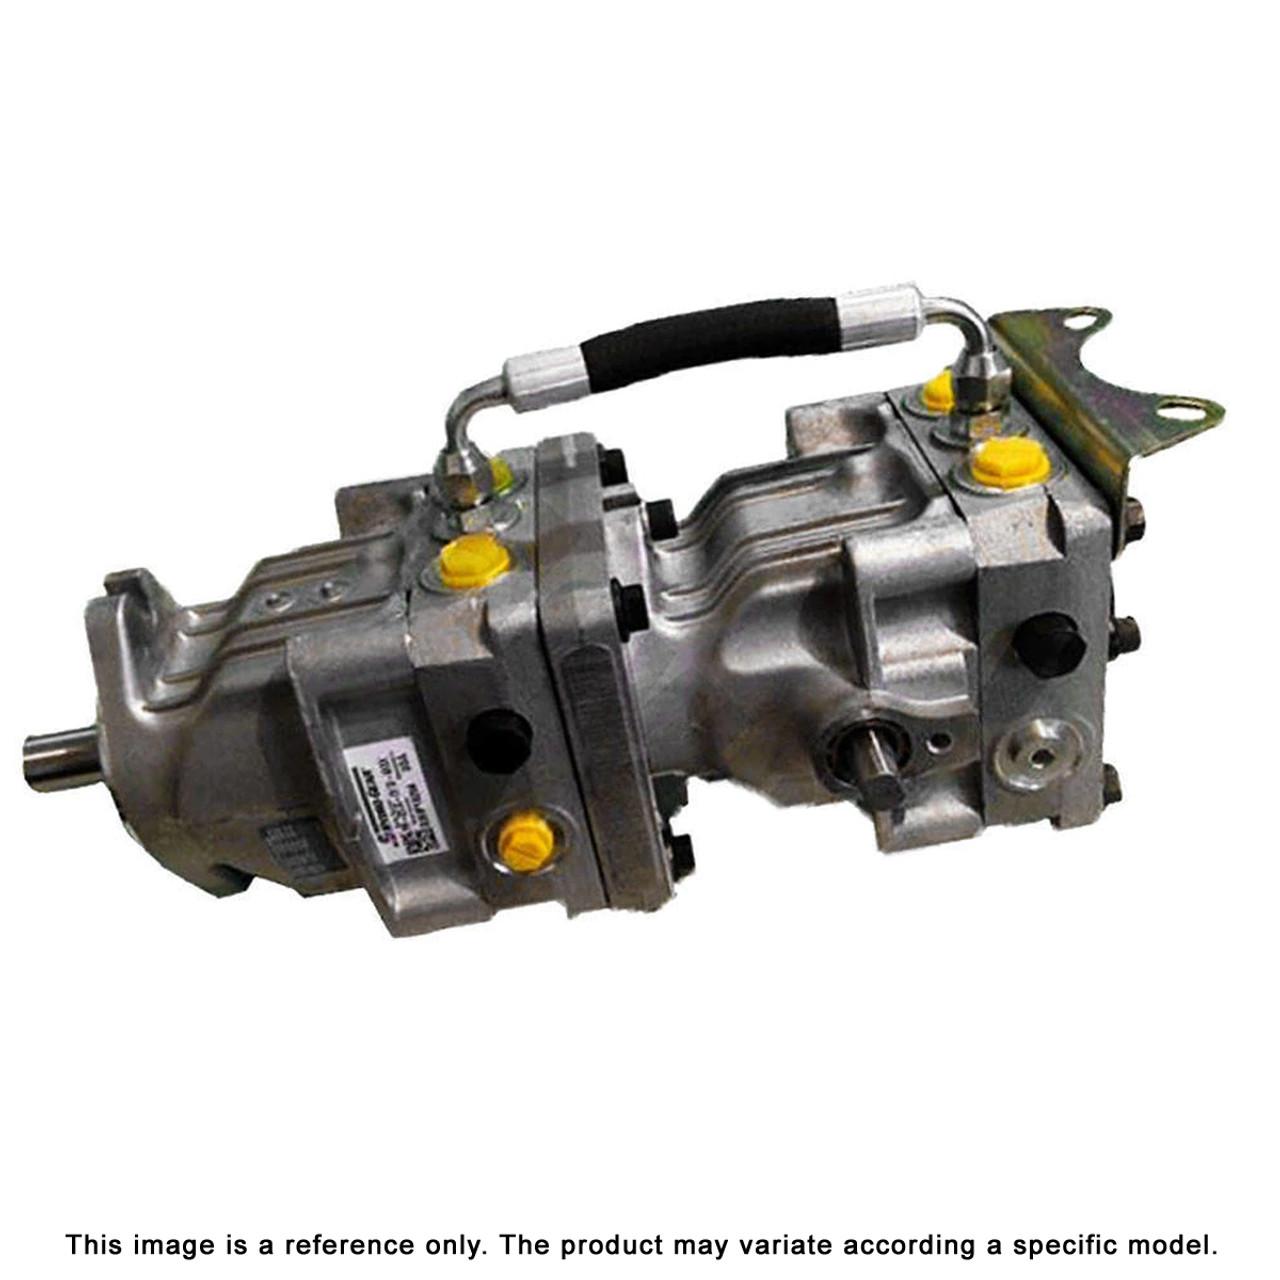 Hydro Gear TC-BBB1-BBB1-91BX Hydraulic Pump Unit OEM